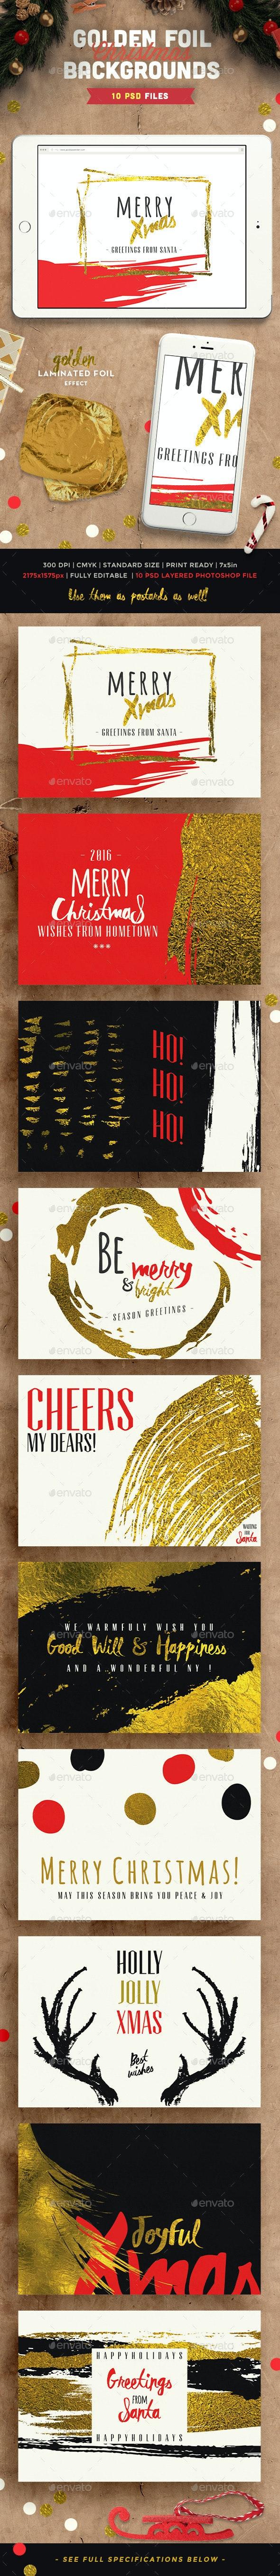 Golden Foil Christmas Backgrounds - Backgrounds Graphics